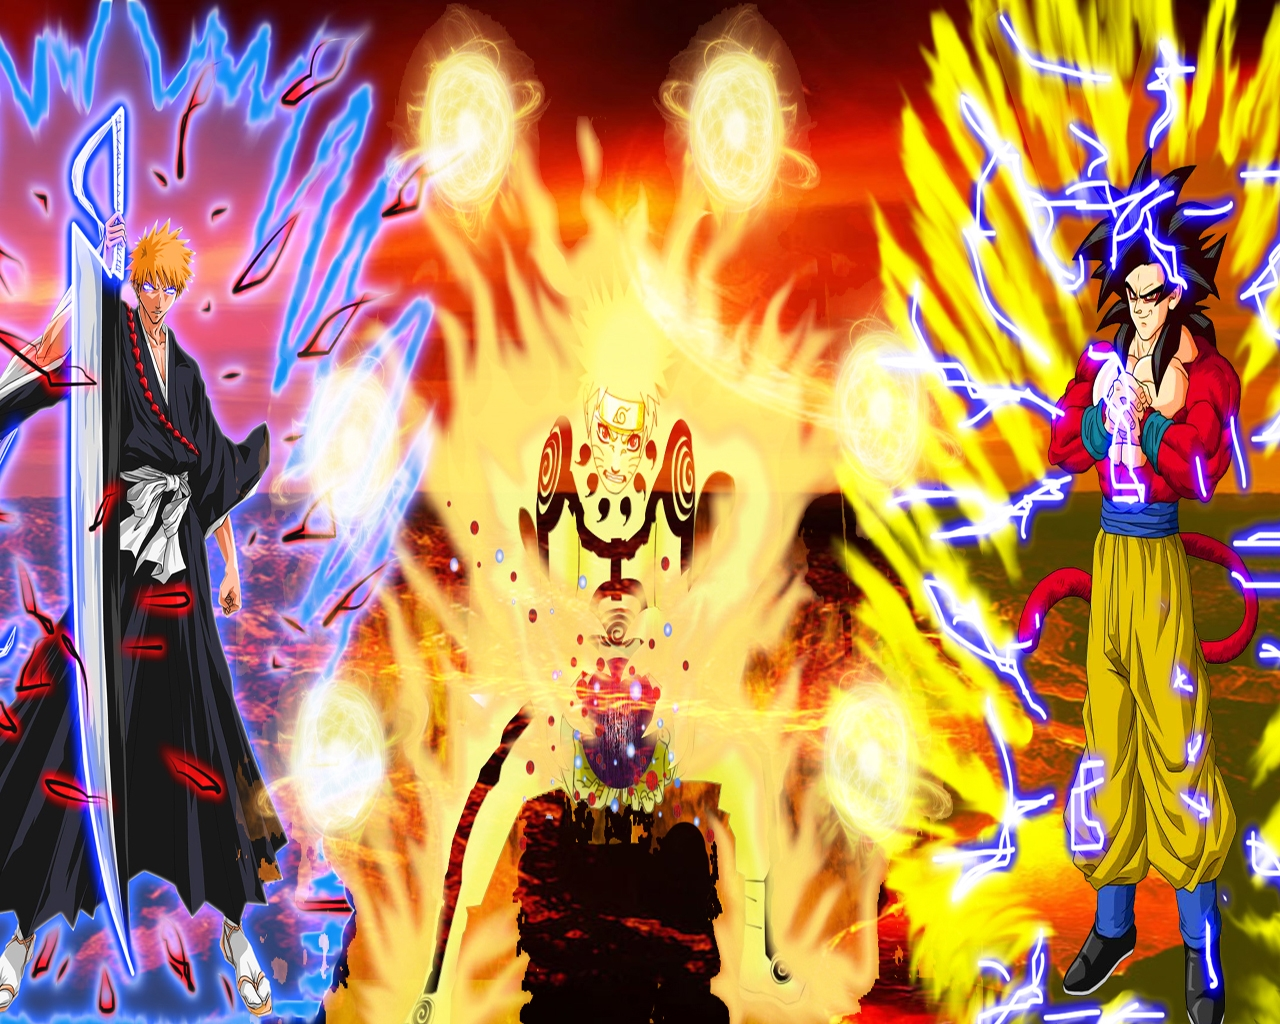 Naruto and Goku Wallpaper 1280x1024